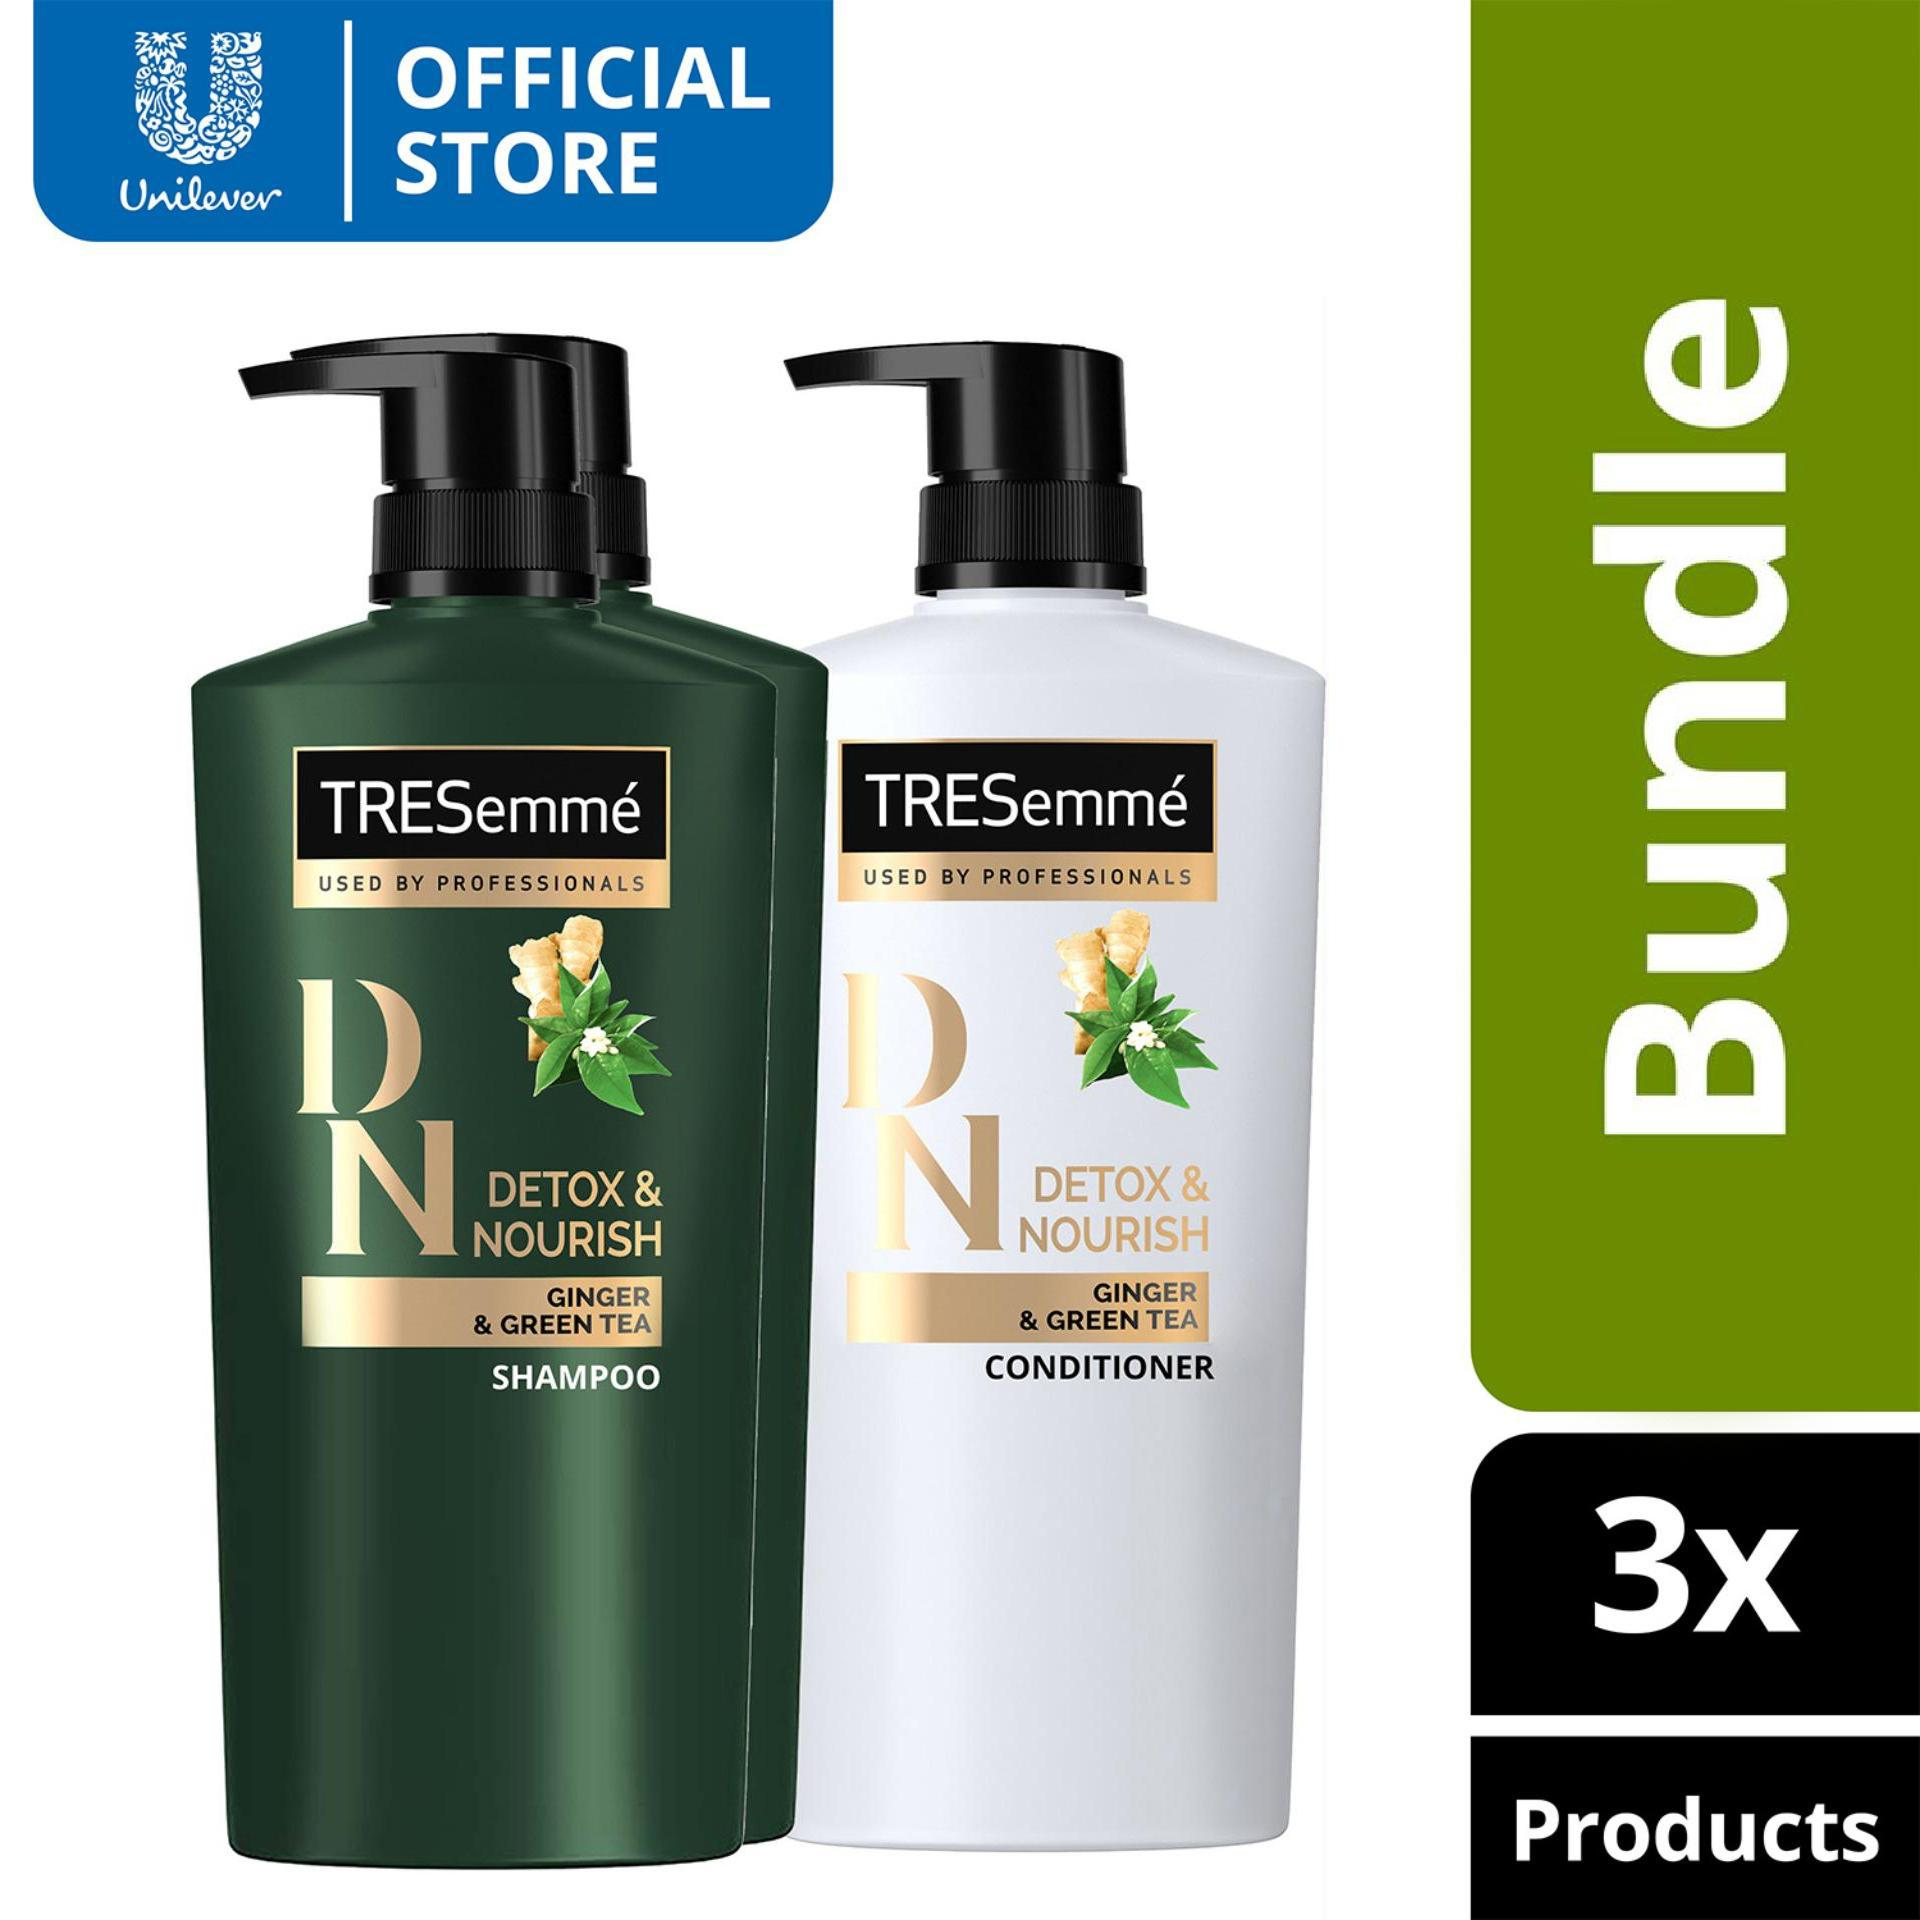 Tresemme Shampoo And Hair Conditioner Detox Nourish 620ml Bundle